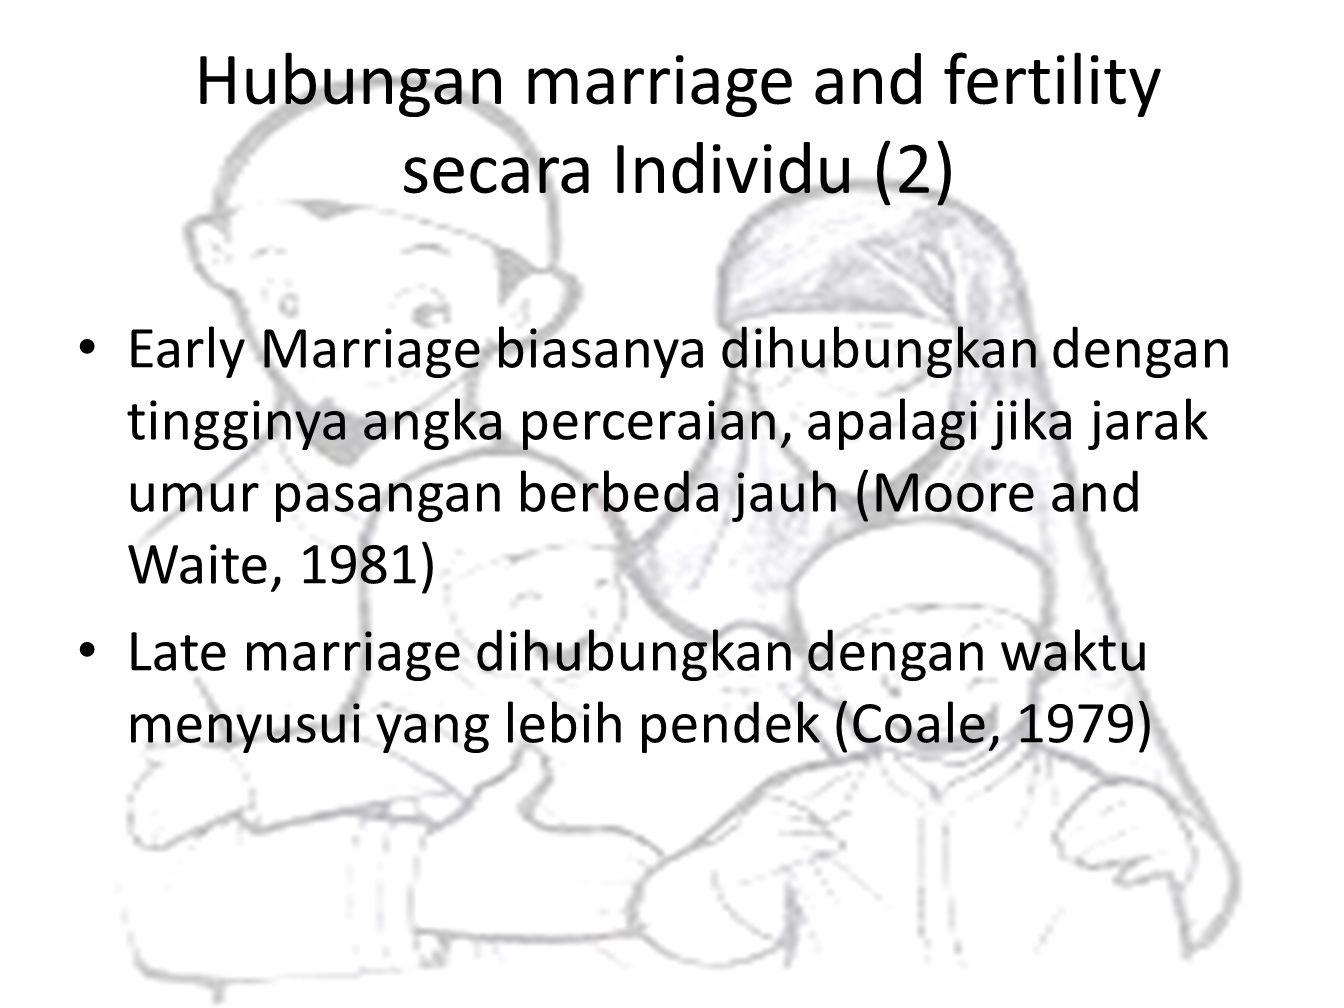 Hubungan marriage and fertility secara Individu (2) • Early Marriage biasanya dihubungkan dengan tingginya angka perceraian, apalagi jika jarak umur p